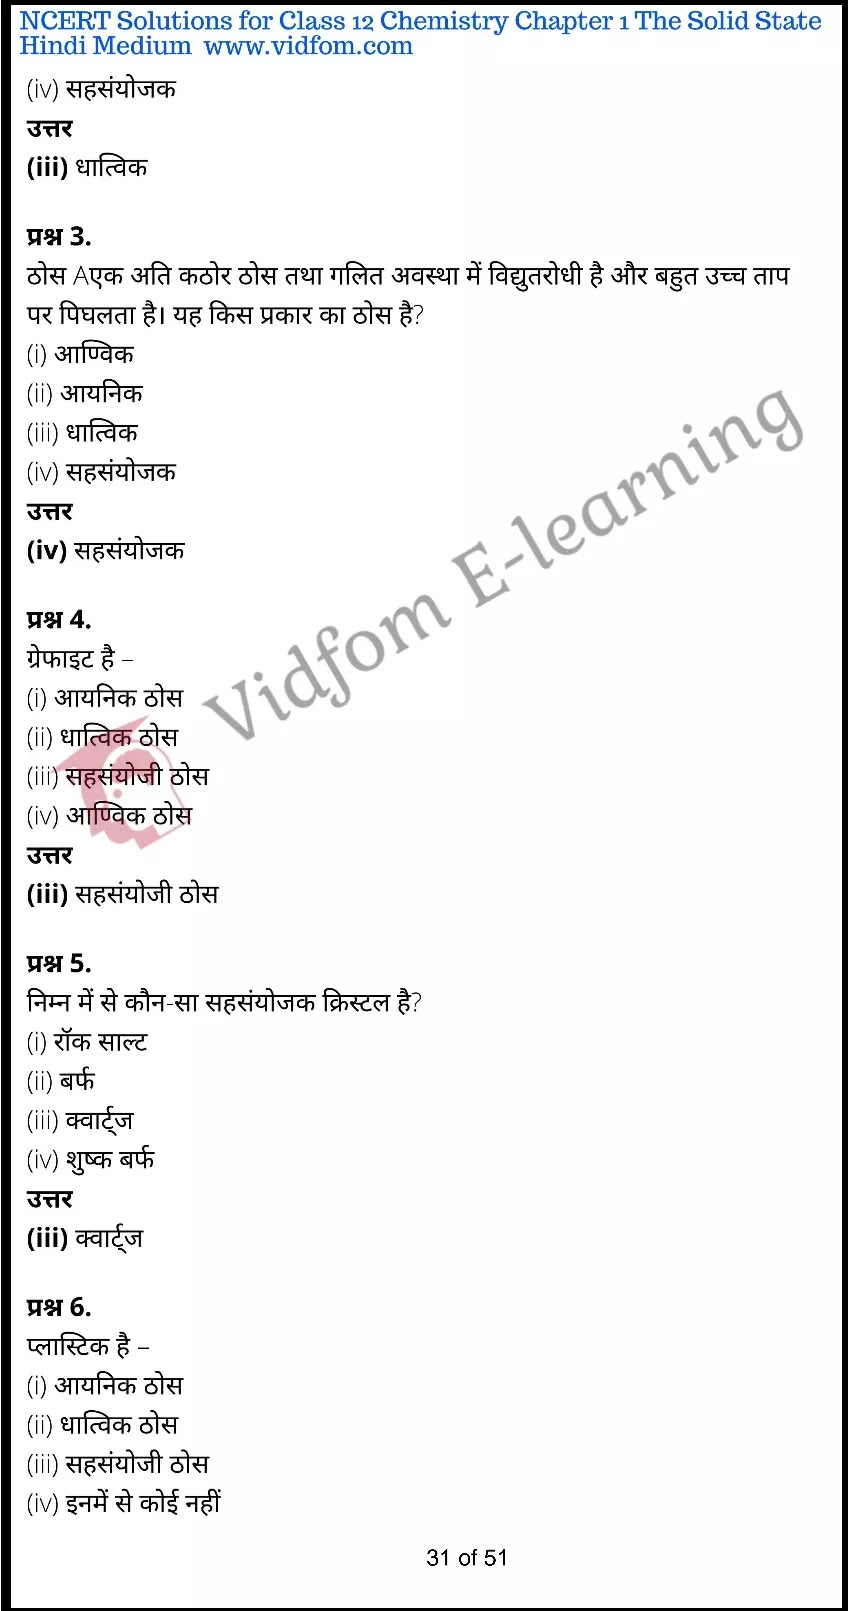 class 12 chemistry chapter 1 light hindi medium 31